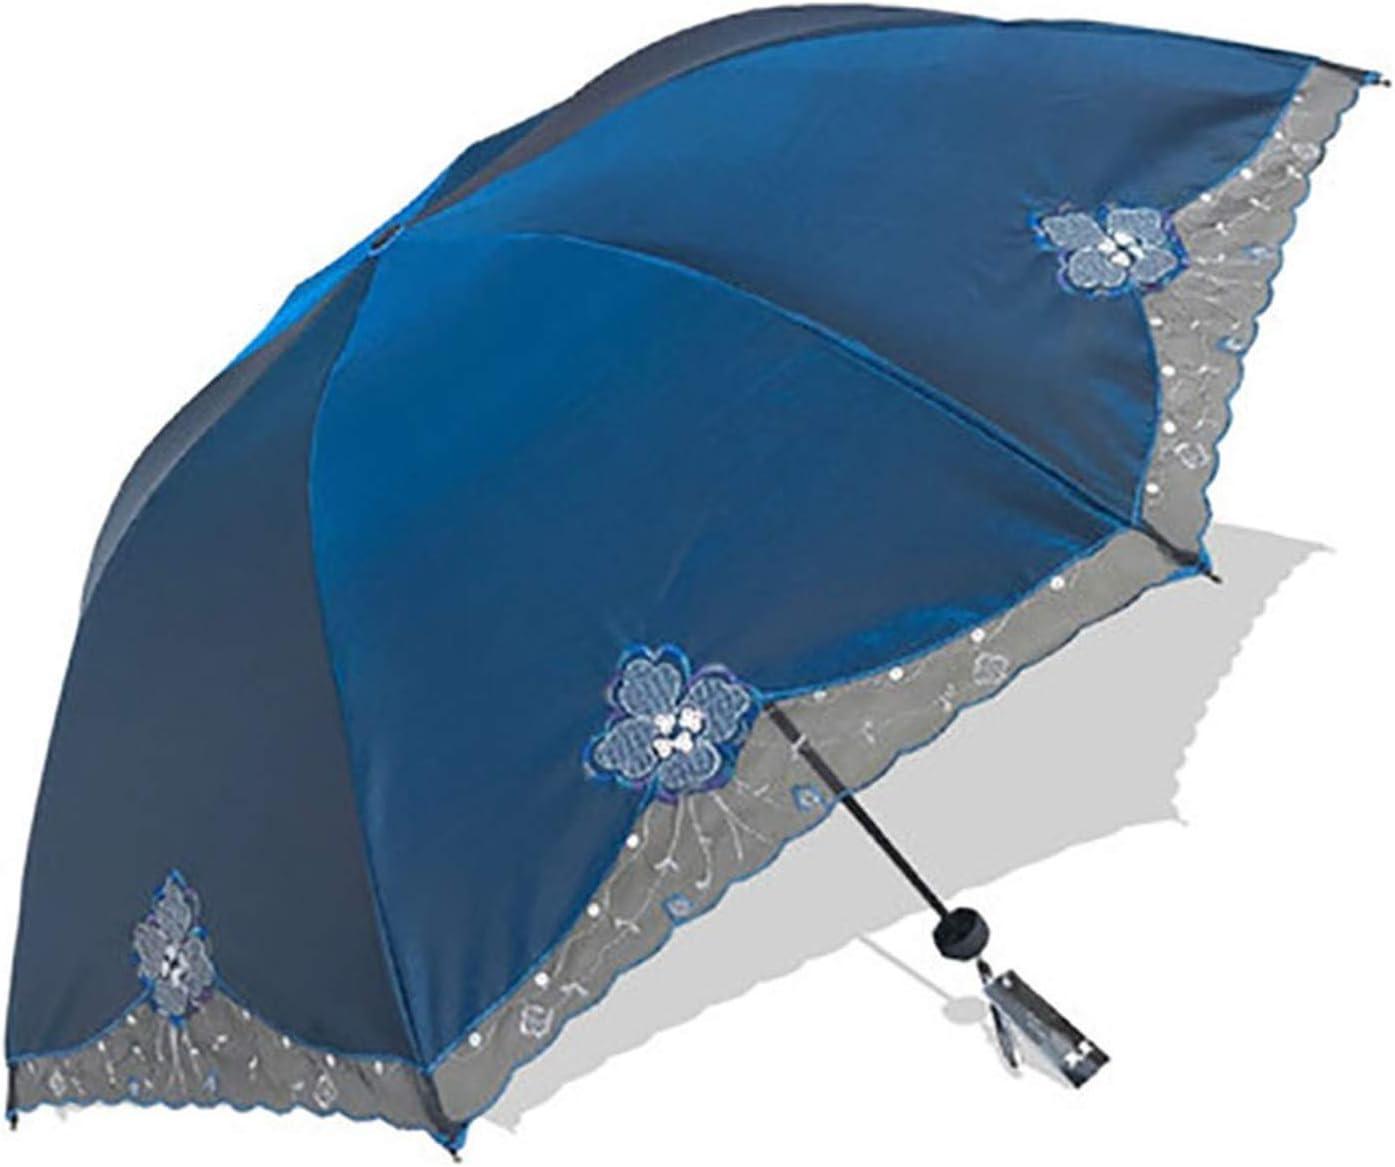 Creative Umbrella Rain Women Trend Large Automatic Umbrella Small Umbrellas Kids Cute Sunny Folding Reverse Umbrella,style 3